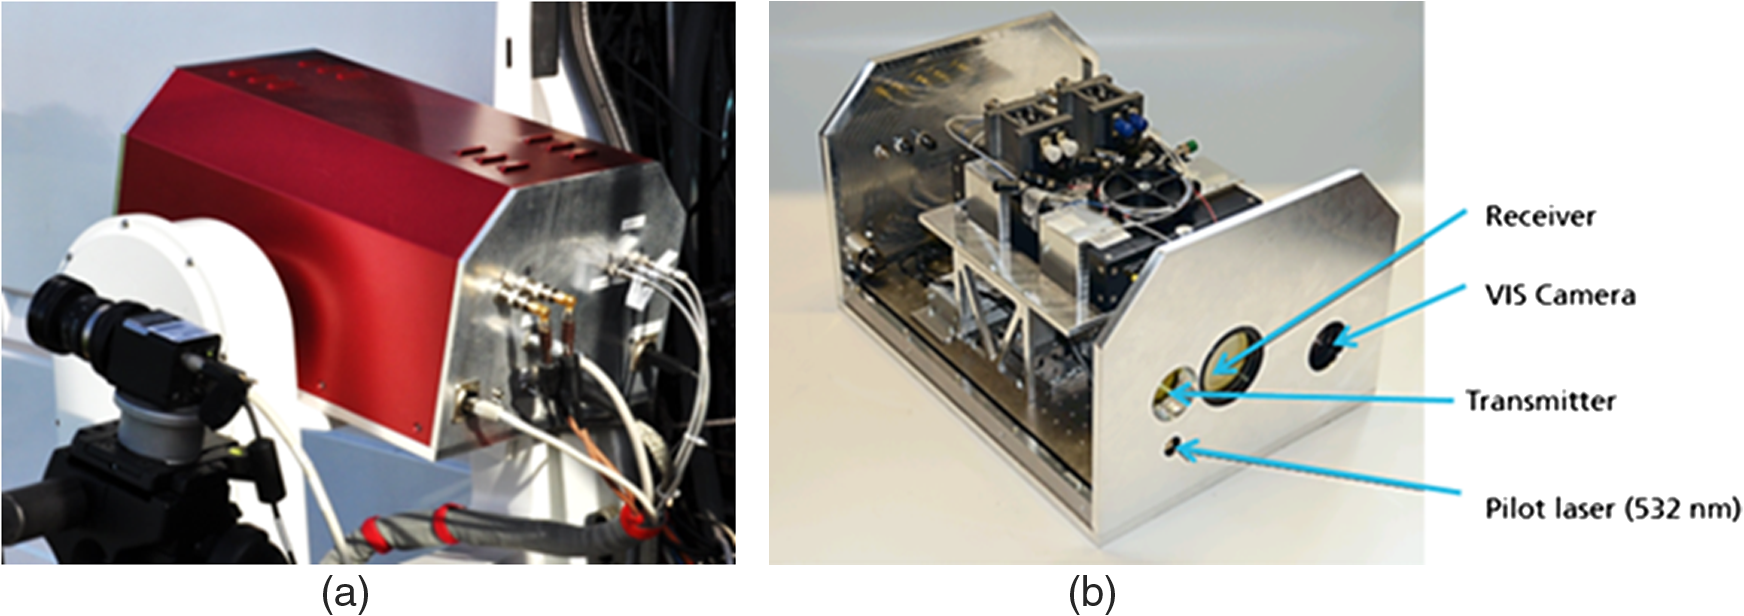 Laser vibration sensing at Fraunhofer IOSB: review and